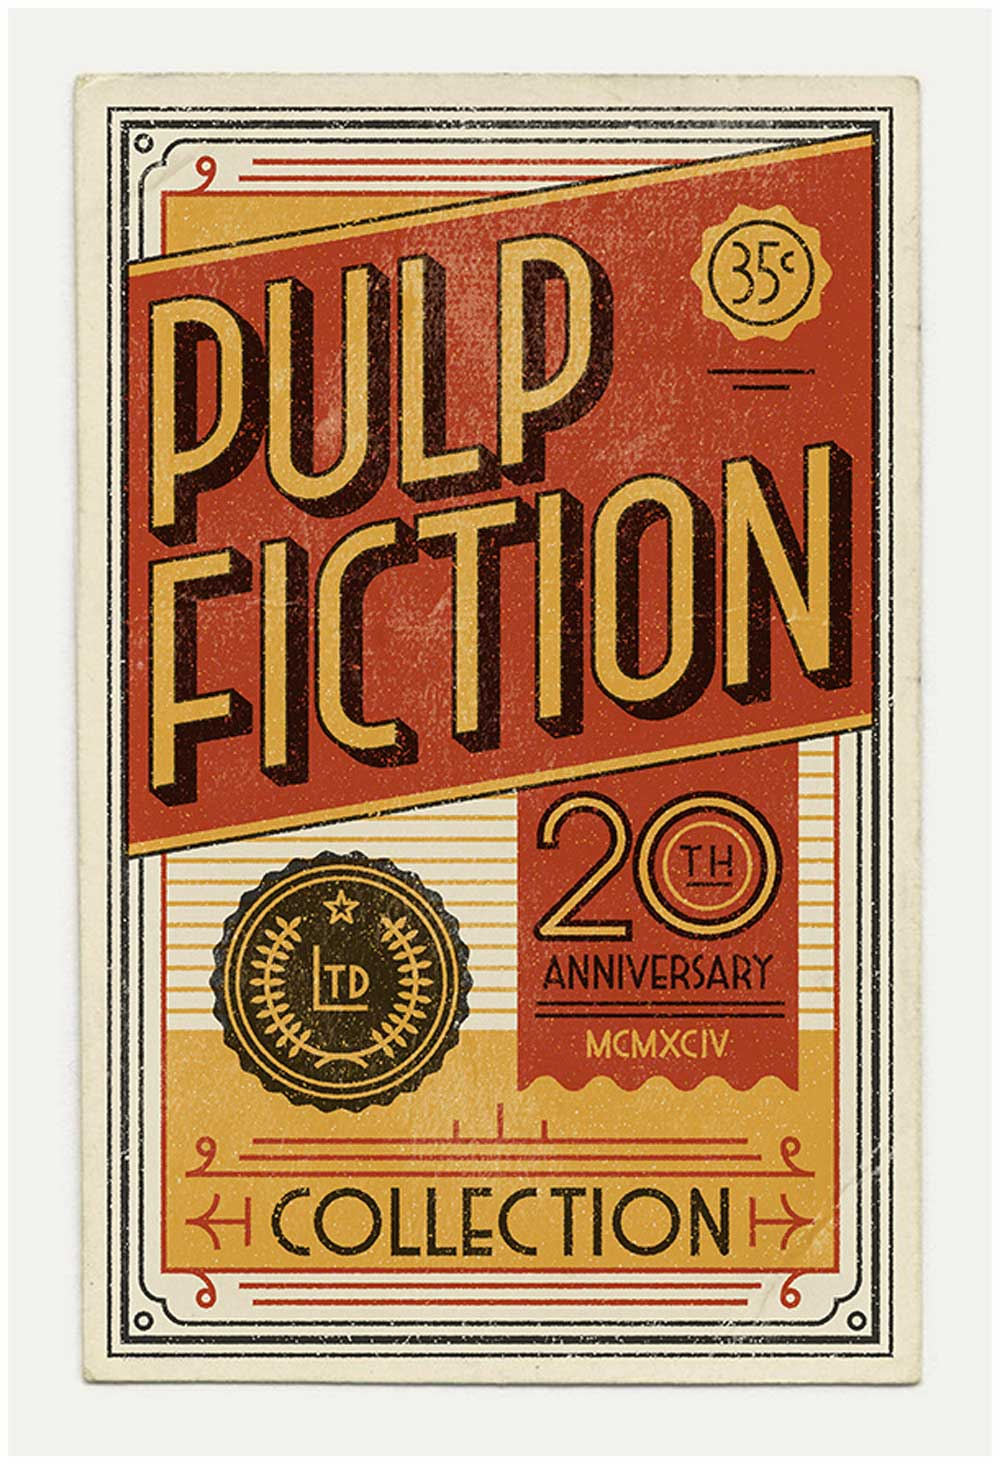 Pulp Fiction by MUTI